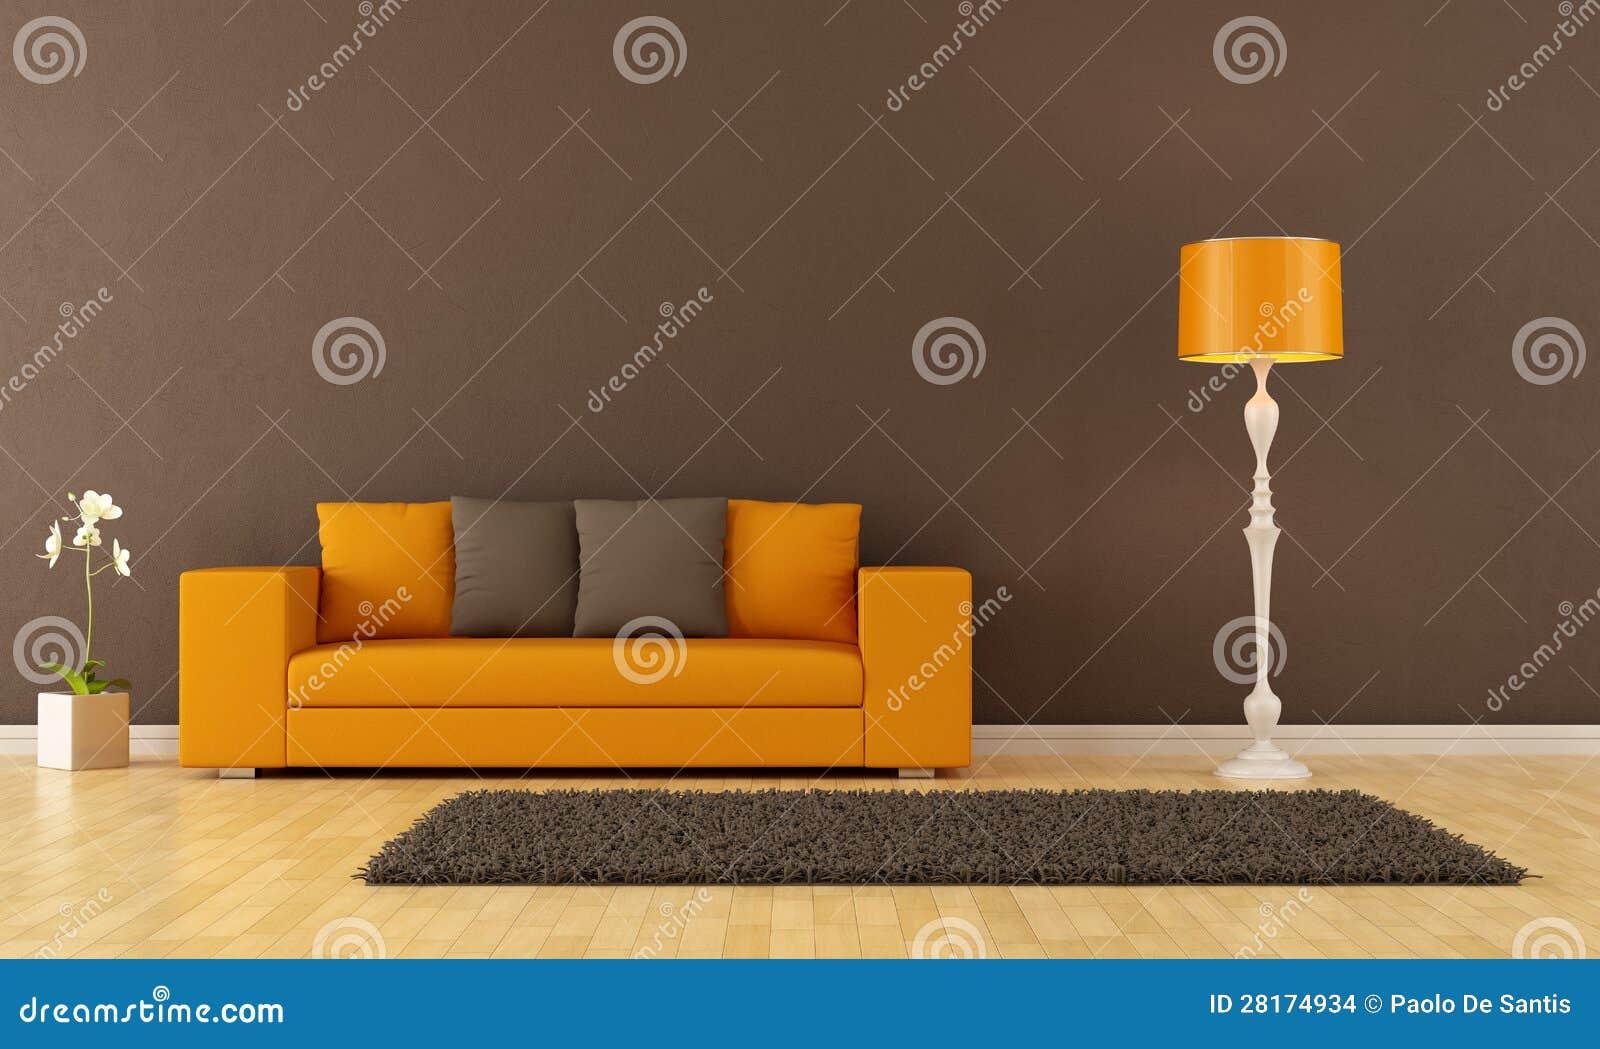 Bruine En Oranje Woonkamer Stock Afbeelding - Afbeelding: 13153381